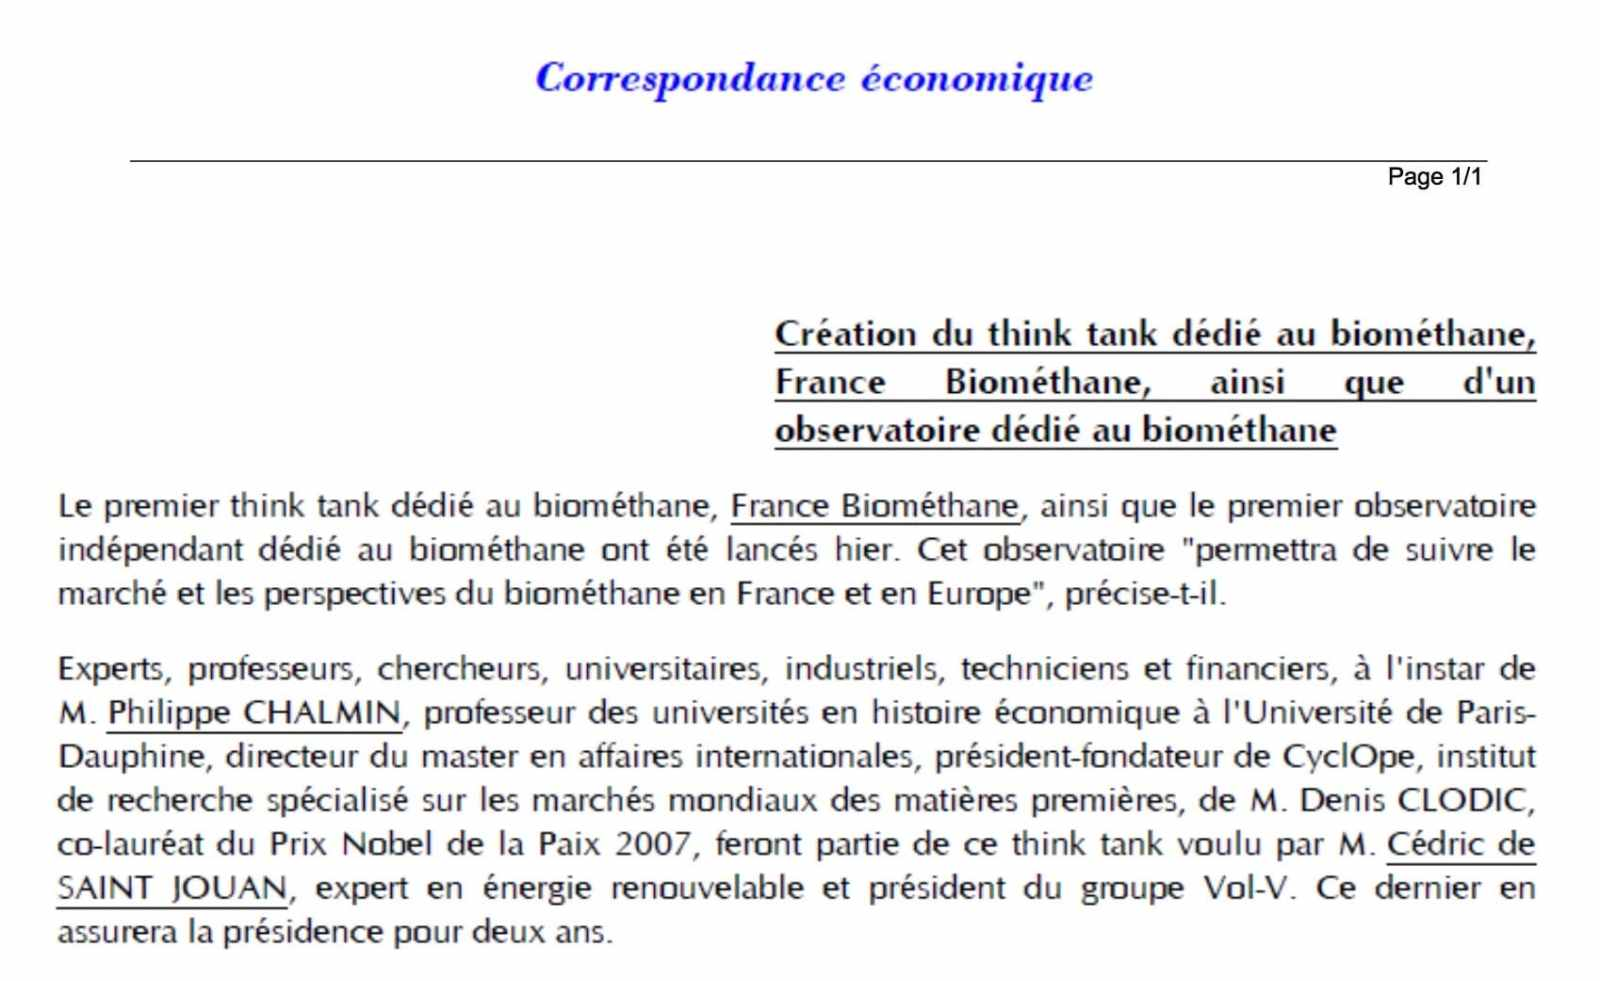 correspondance économique